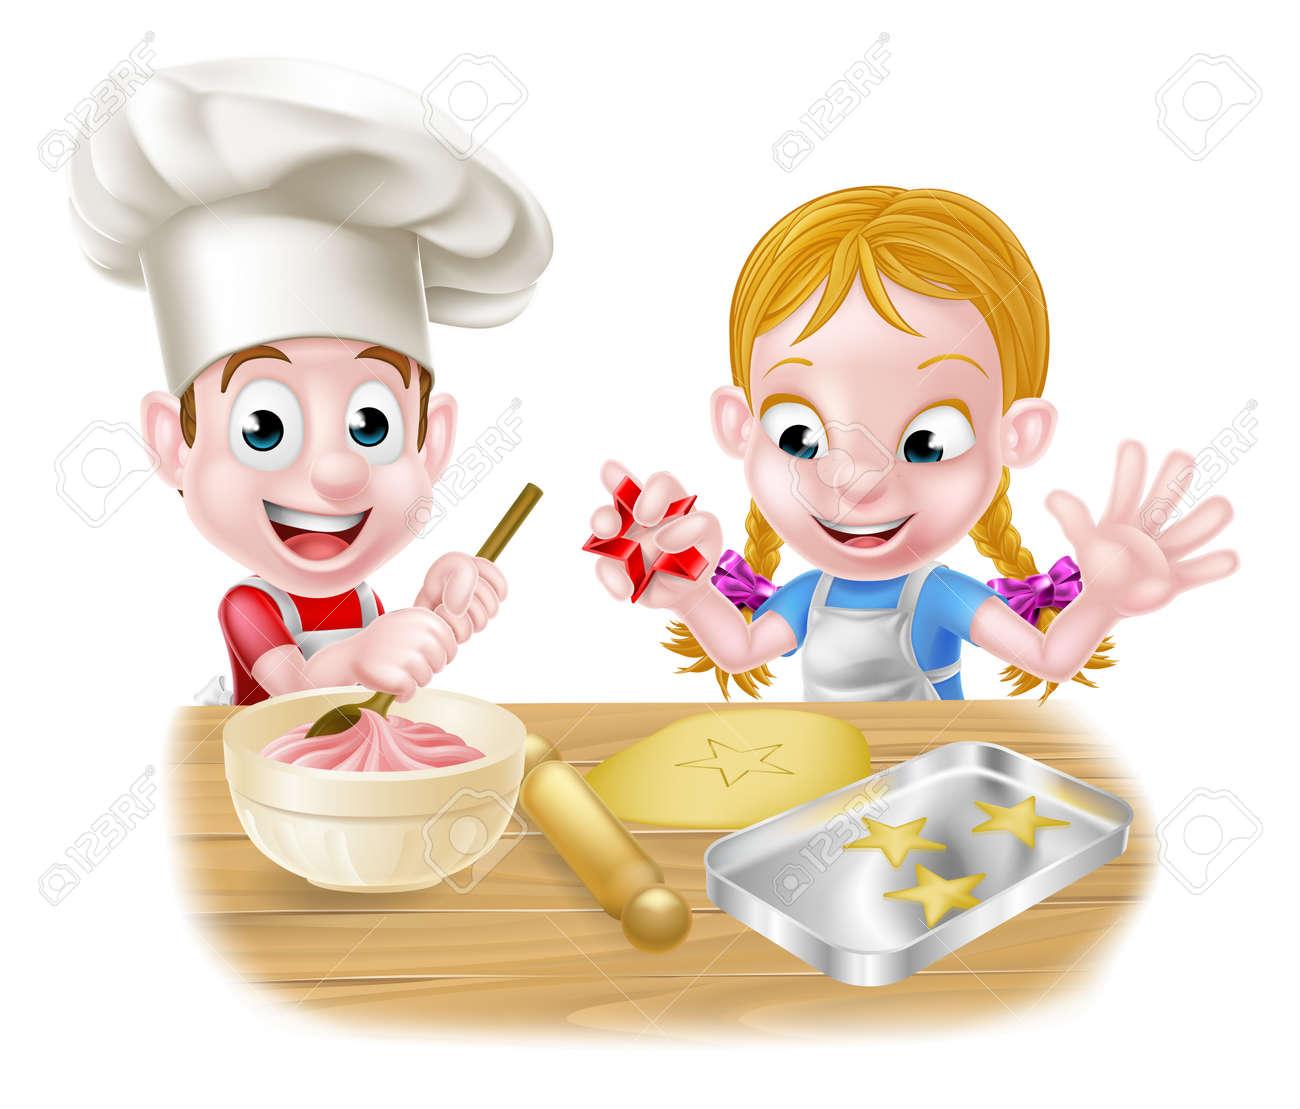 Cartoon chef children baking dessert cakes and biscuits in the kitchen - 52211434